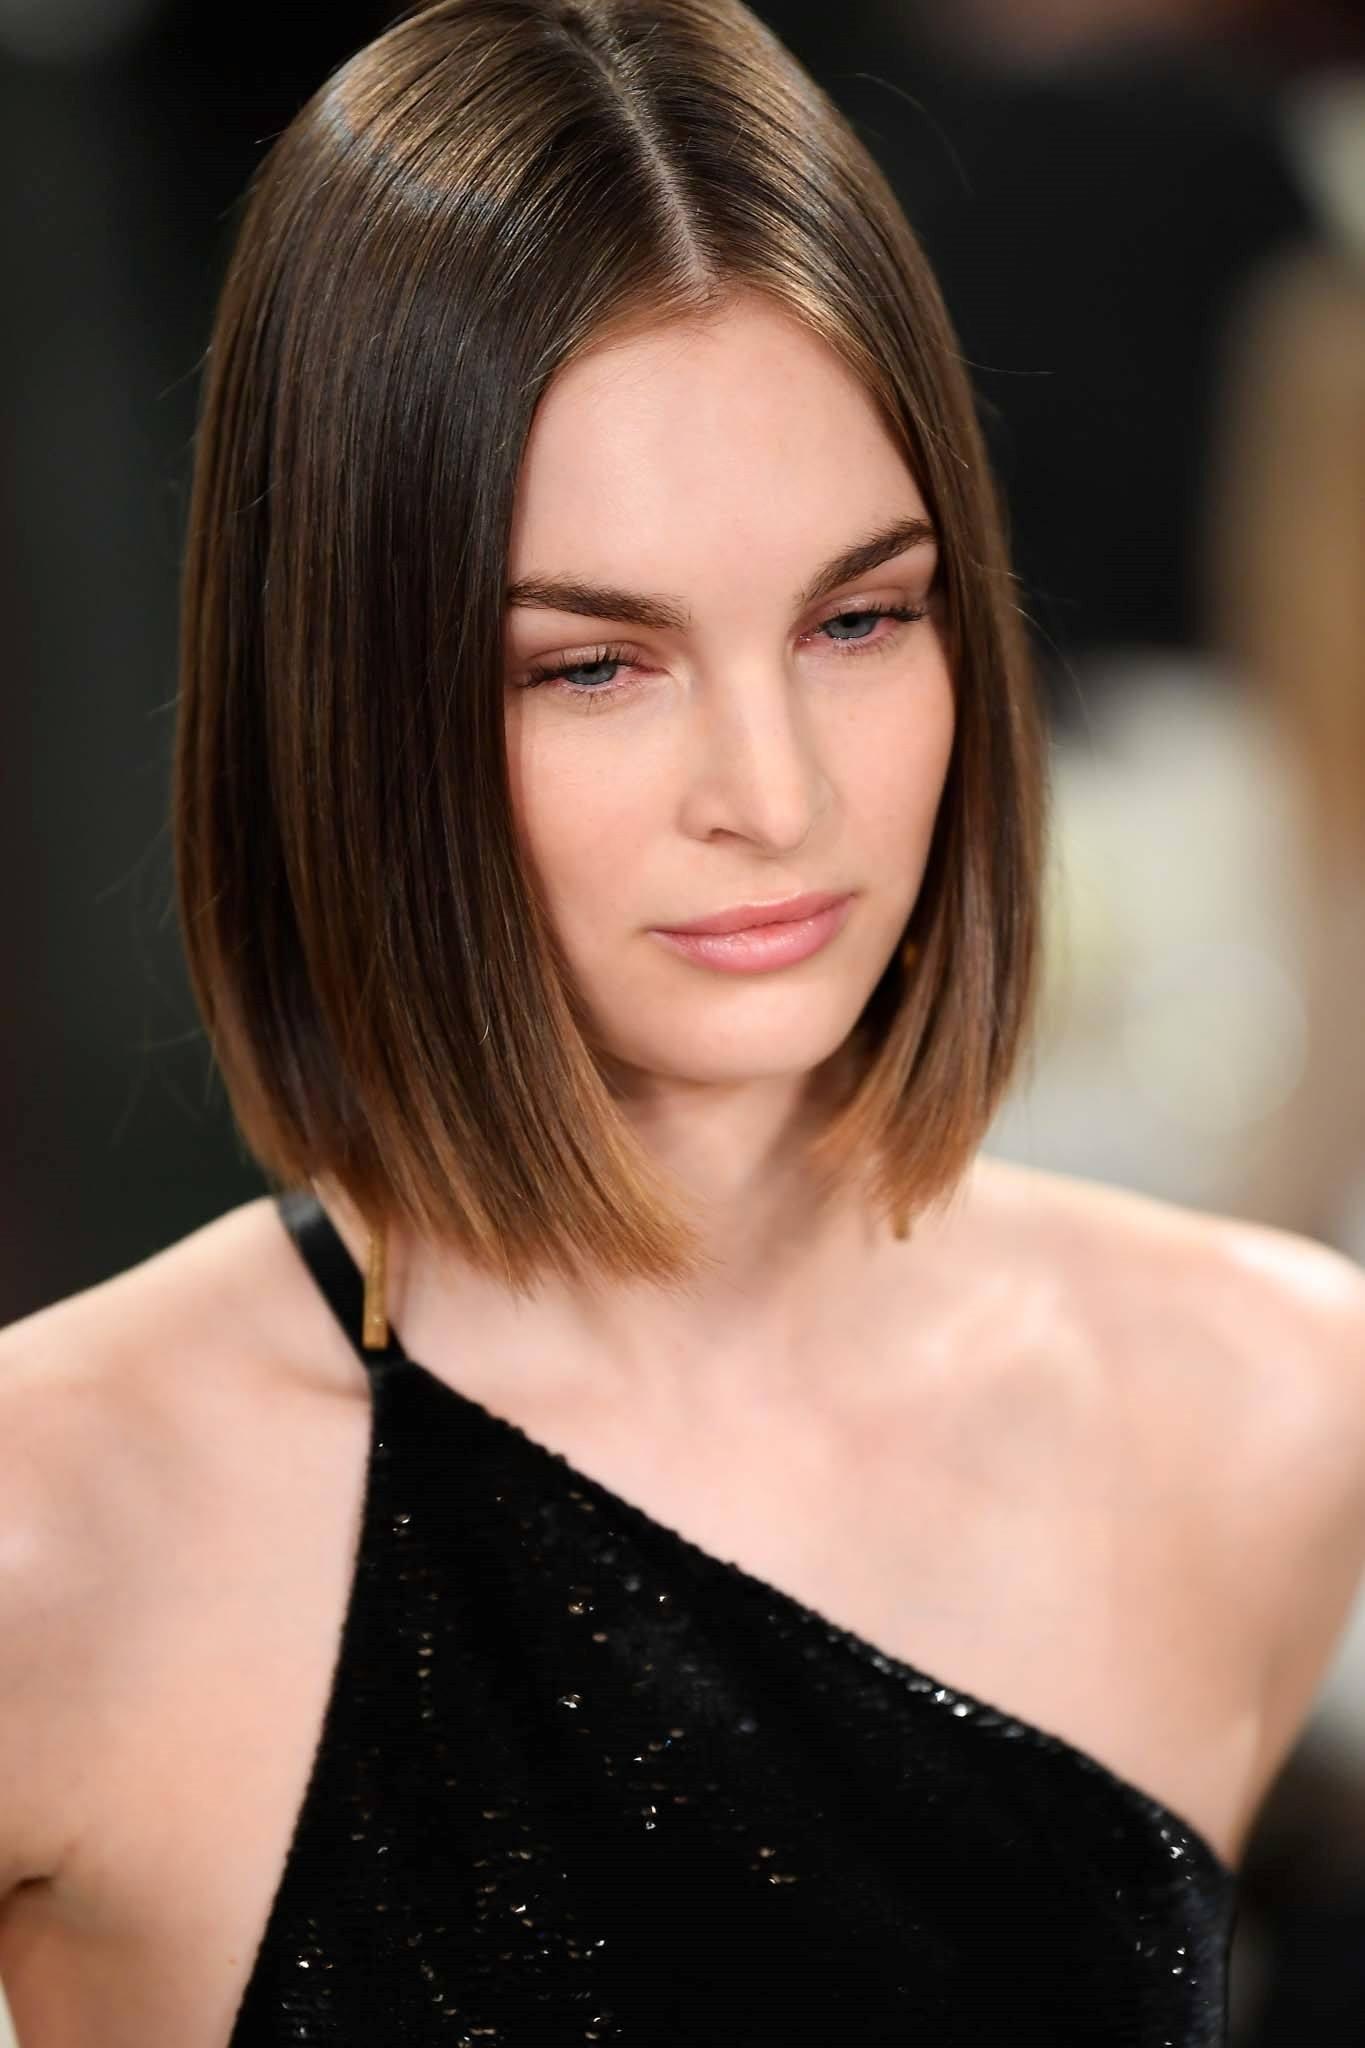 Straight hair ideas: Caucasian woman with dark medium-length hair